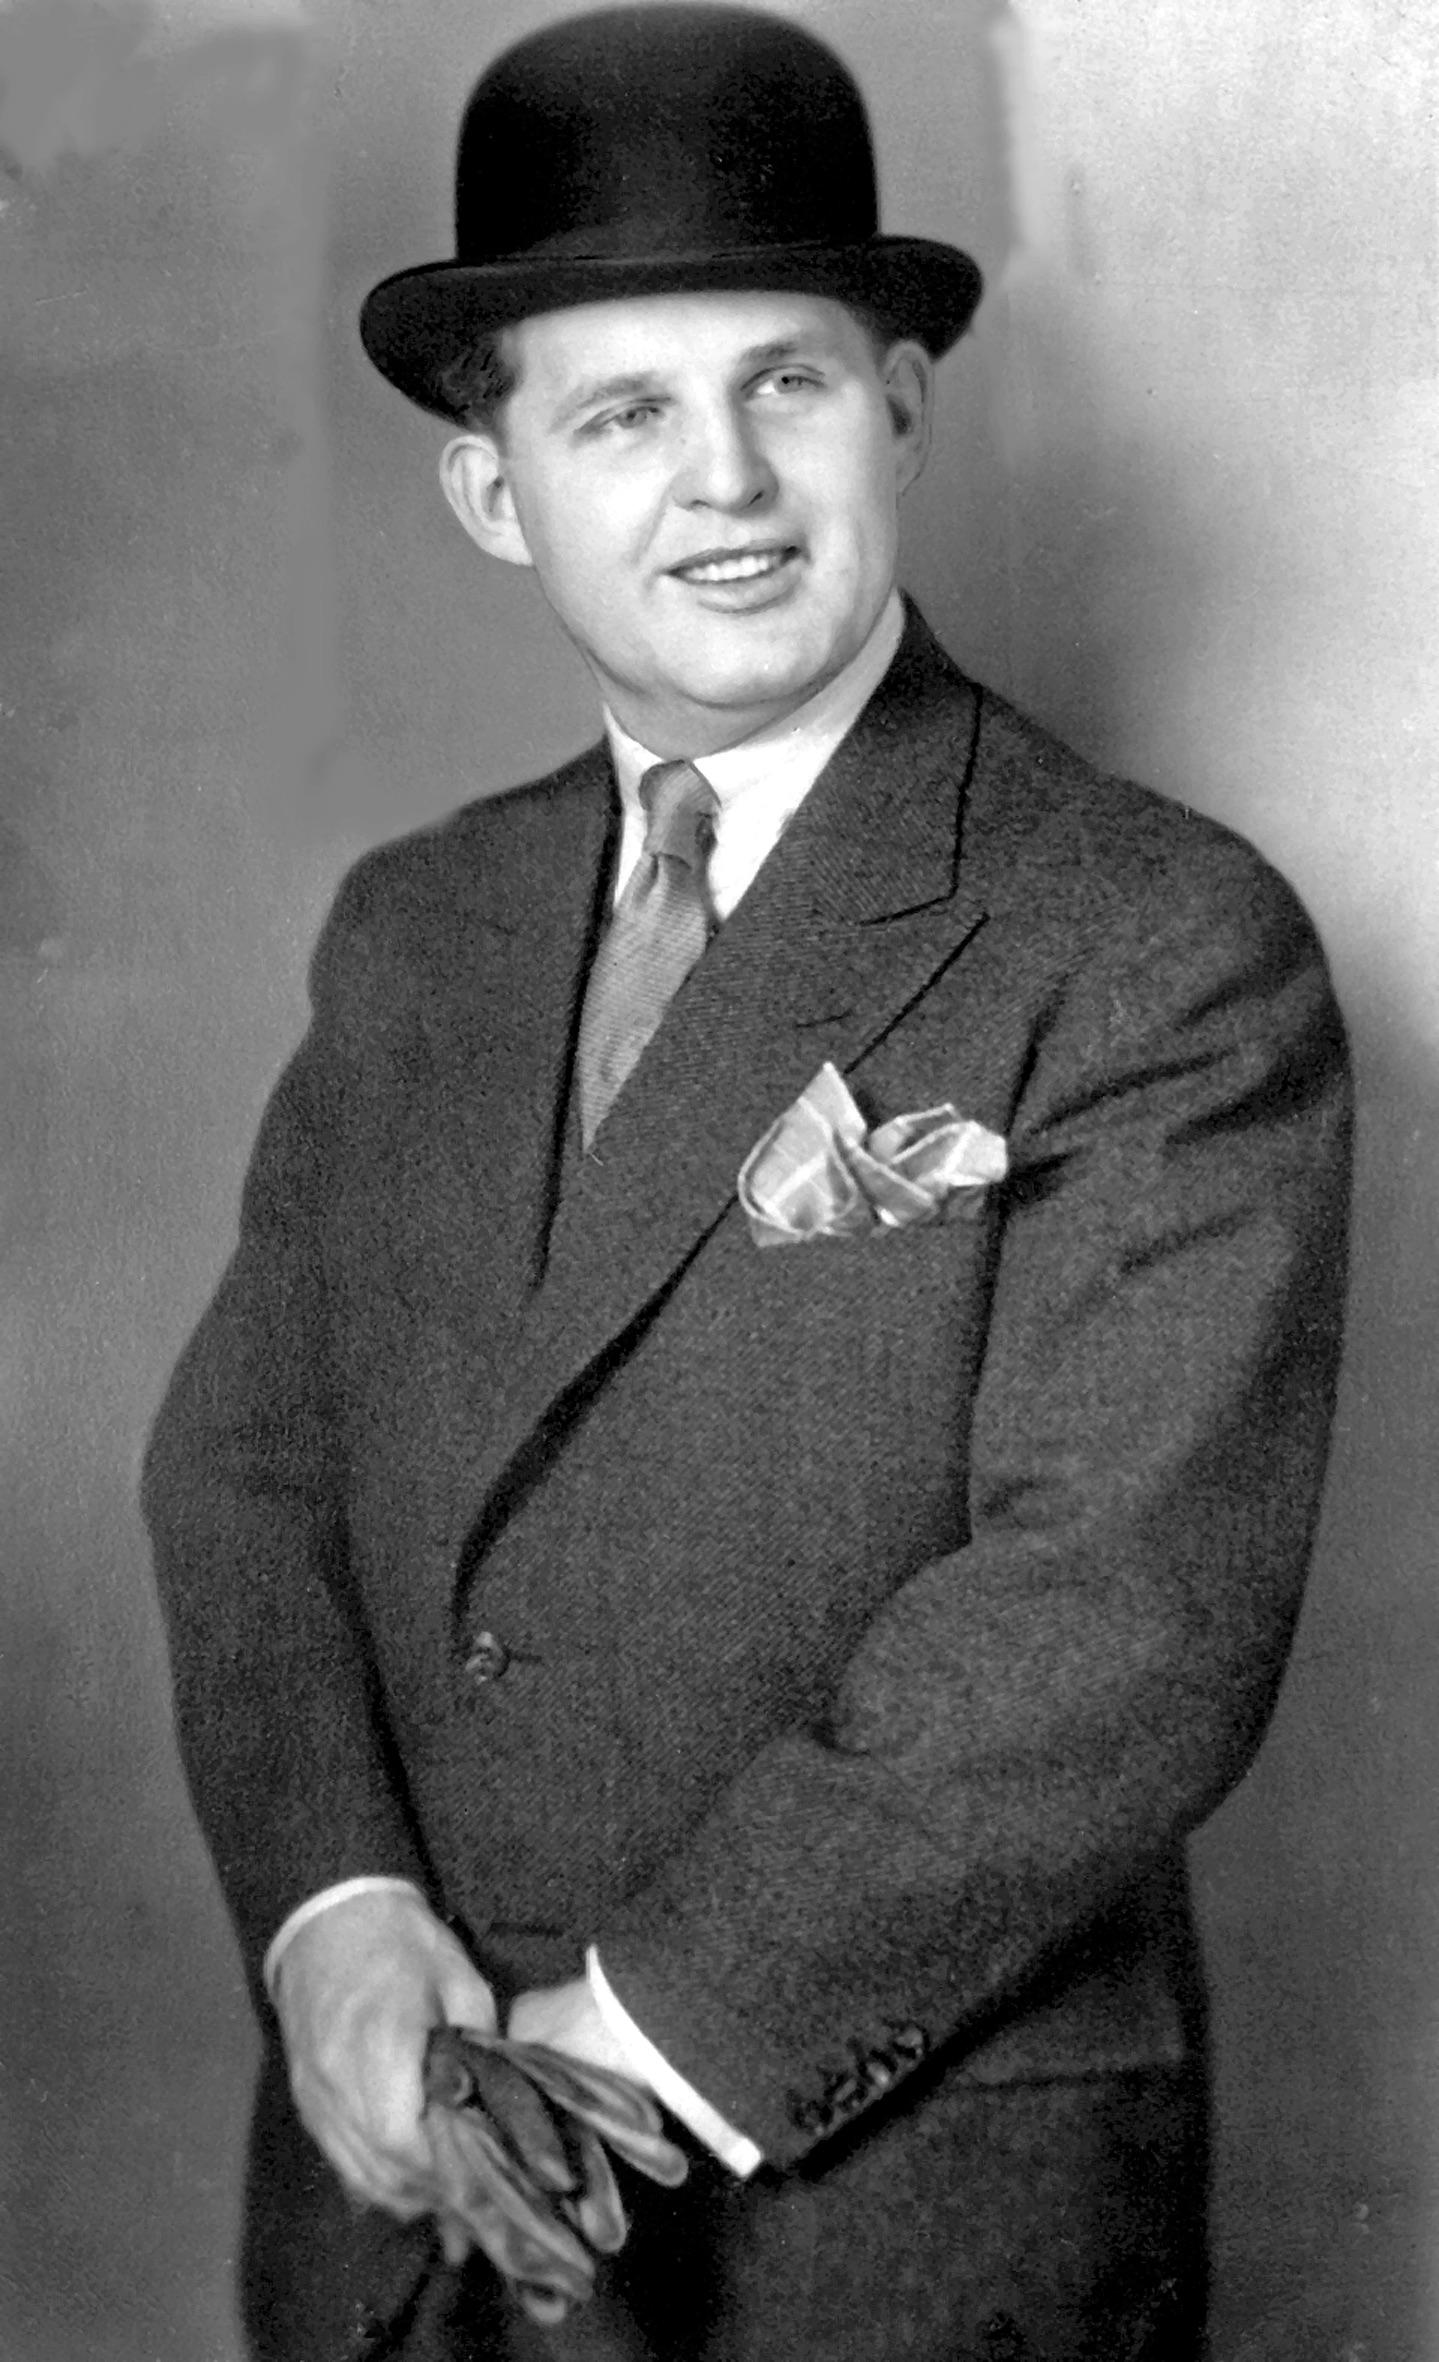 Foto Meisels 1930